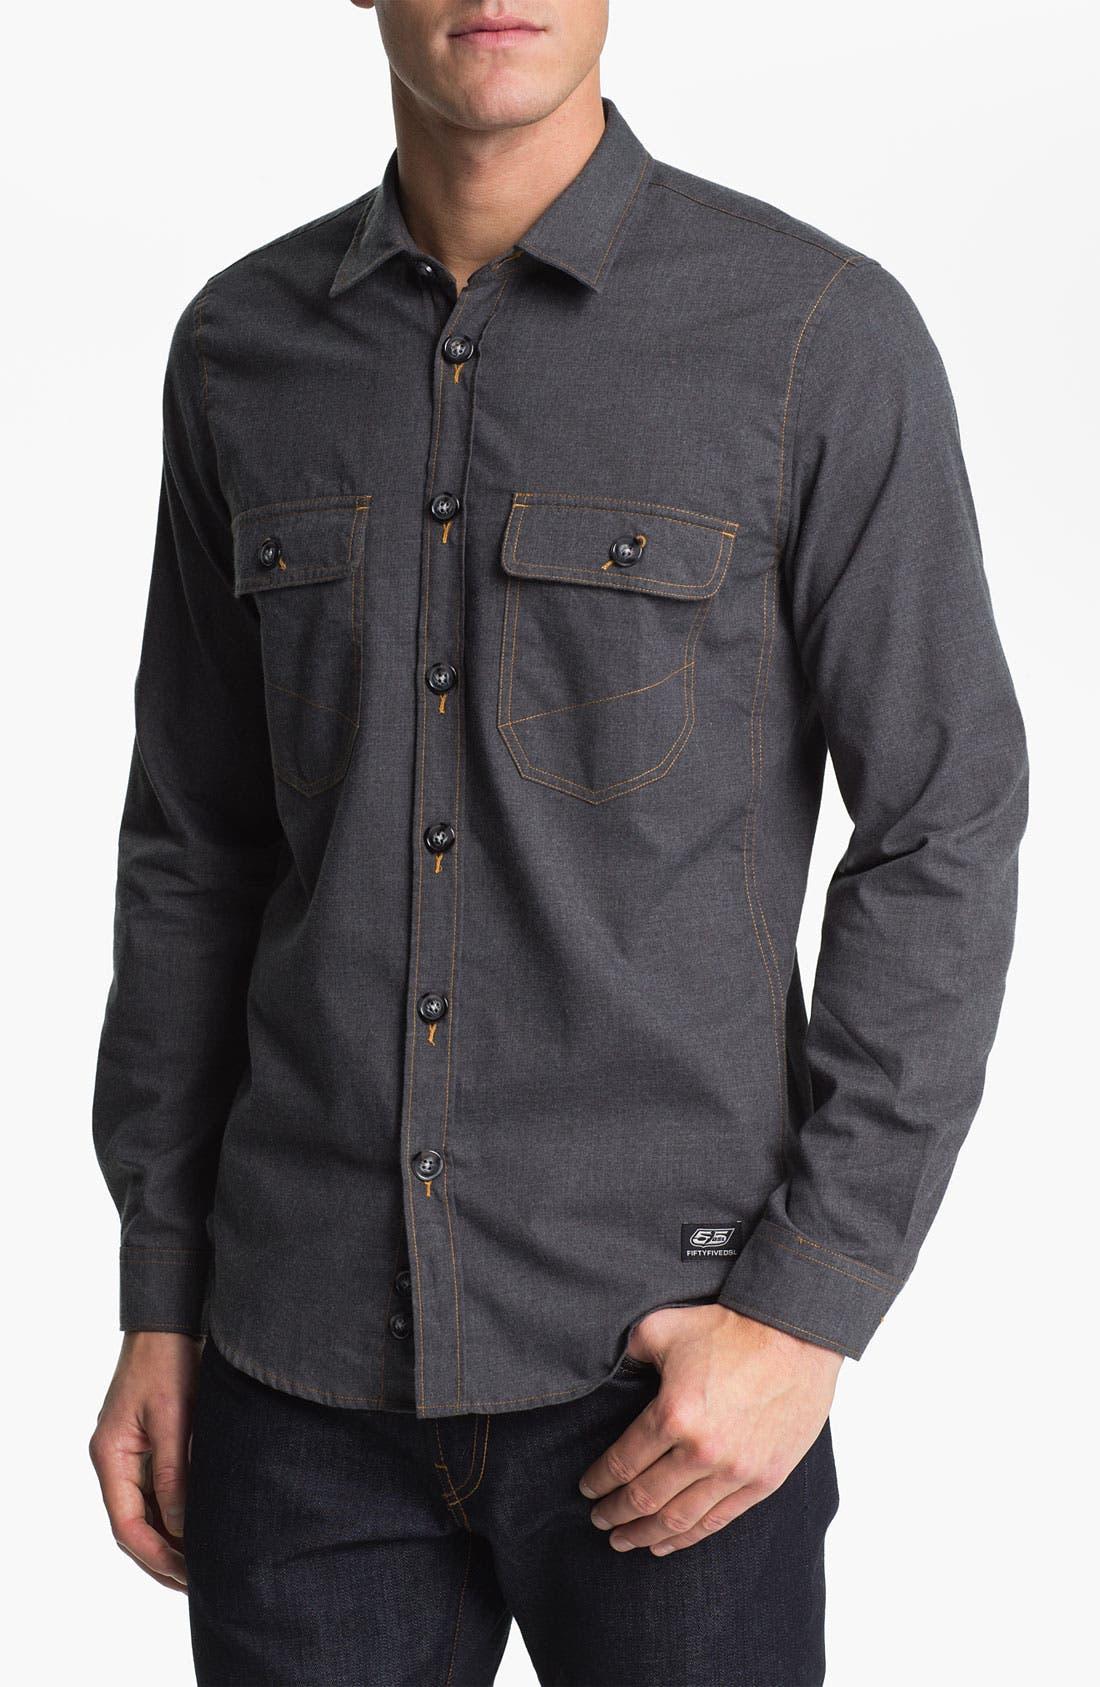 Alternate Image 1 Selected - 55DSL 'Santos' Woven Shirt